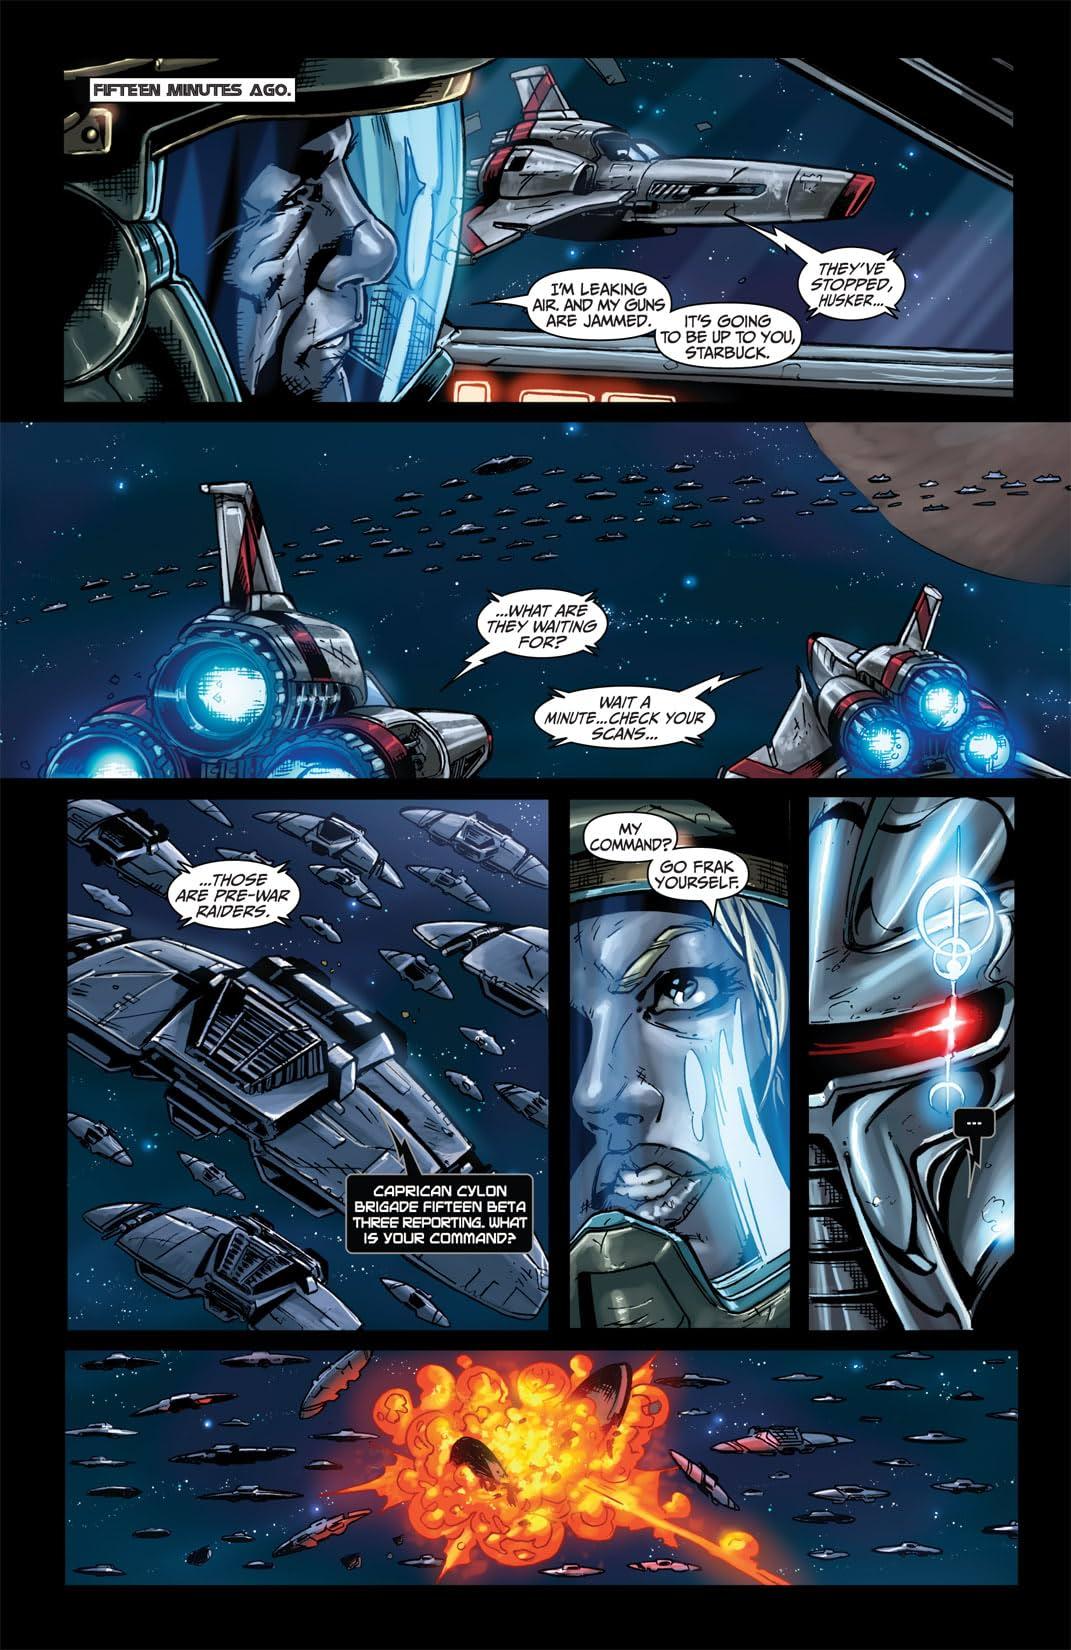 Battlestar Galactica #4